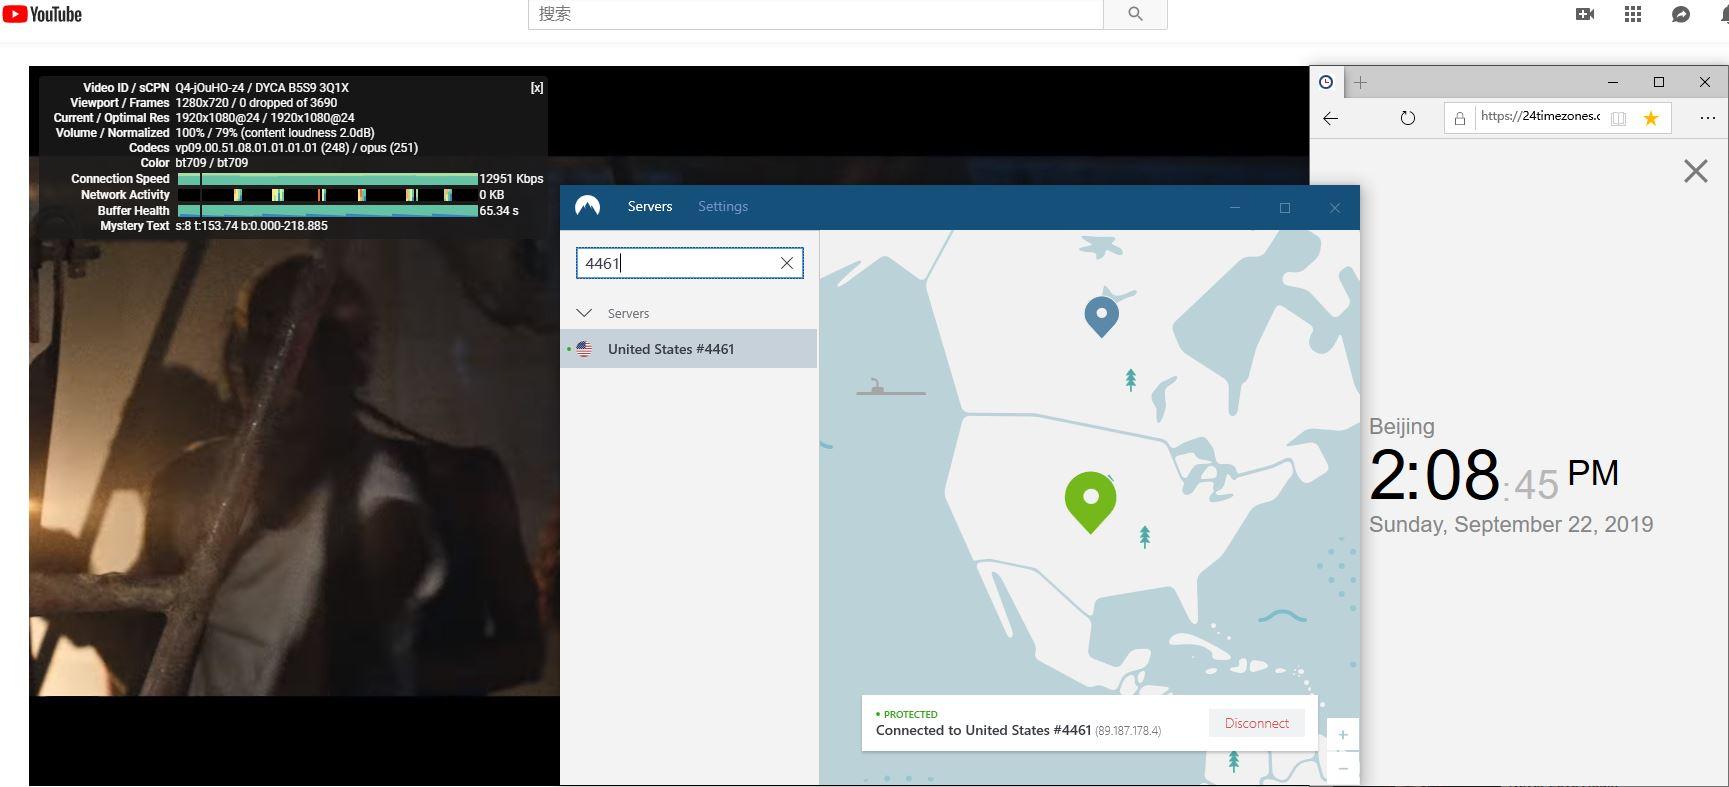 Windows nordVPN united States 4461 服务器 中国VPN翻墙 科学上网 YouTube测速-20190922